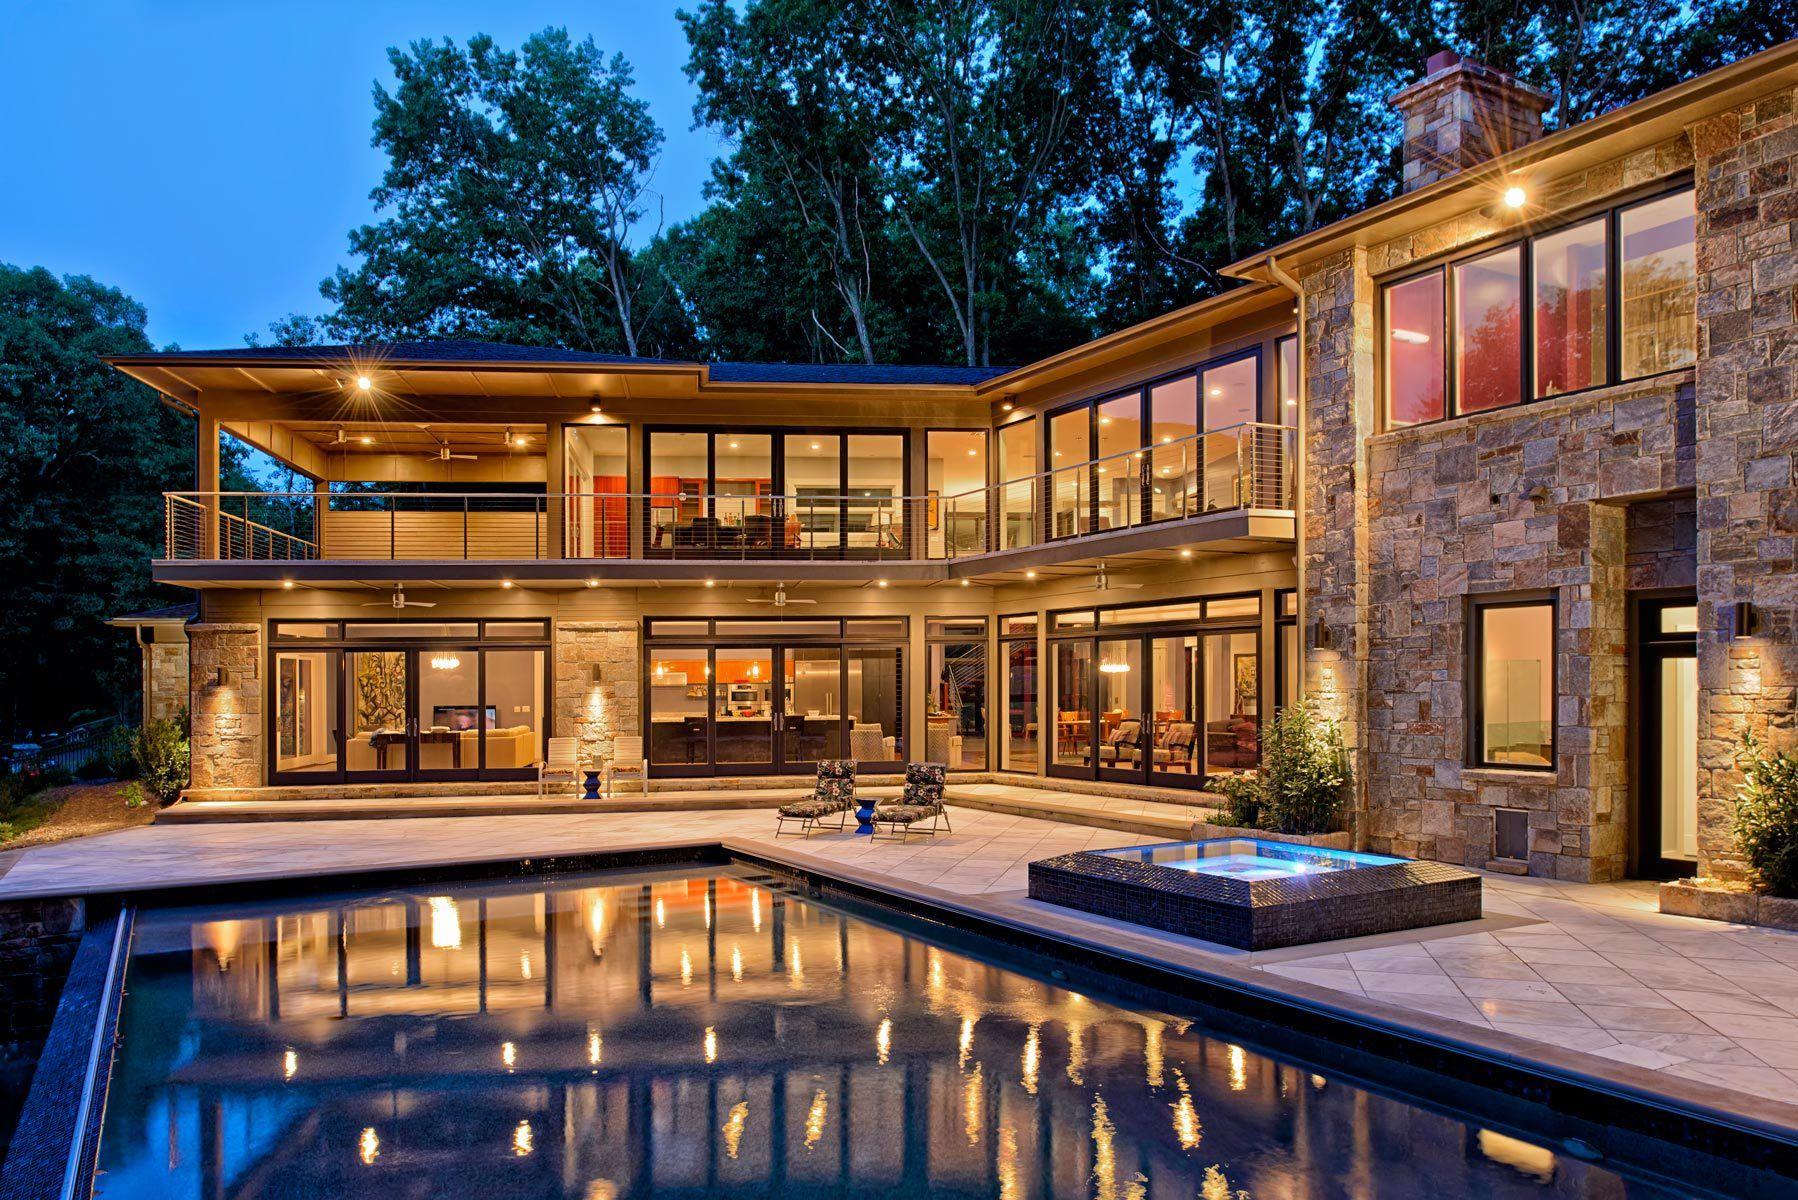 WC Ralston Architects